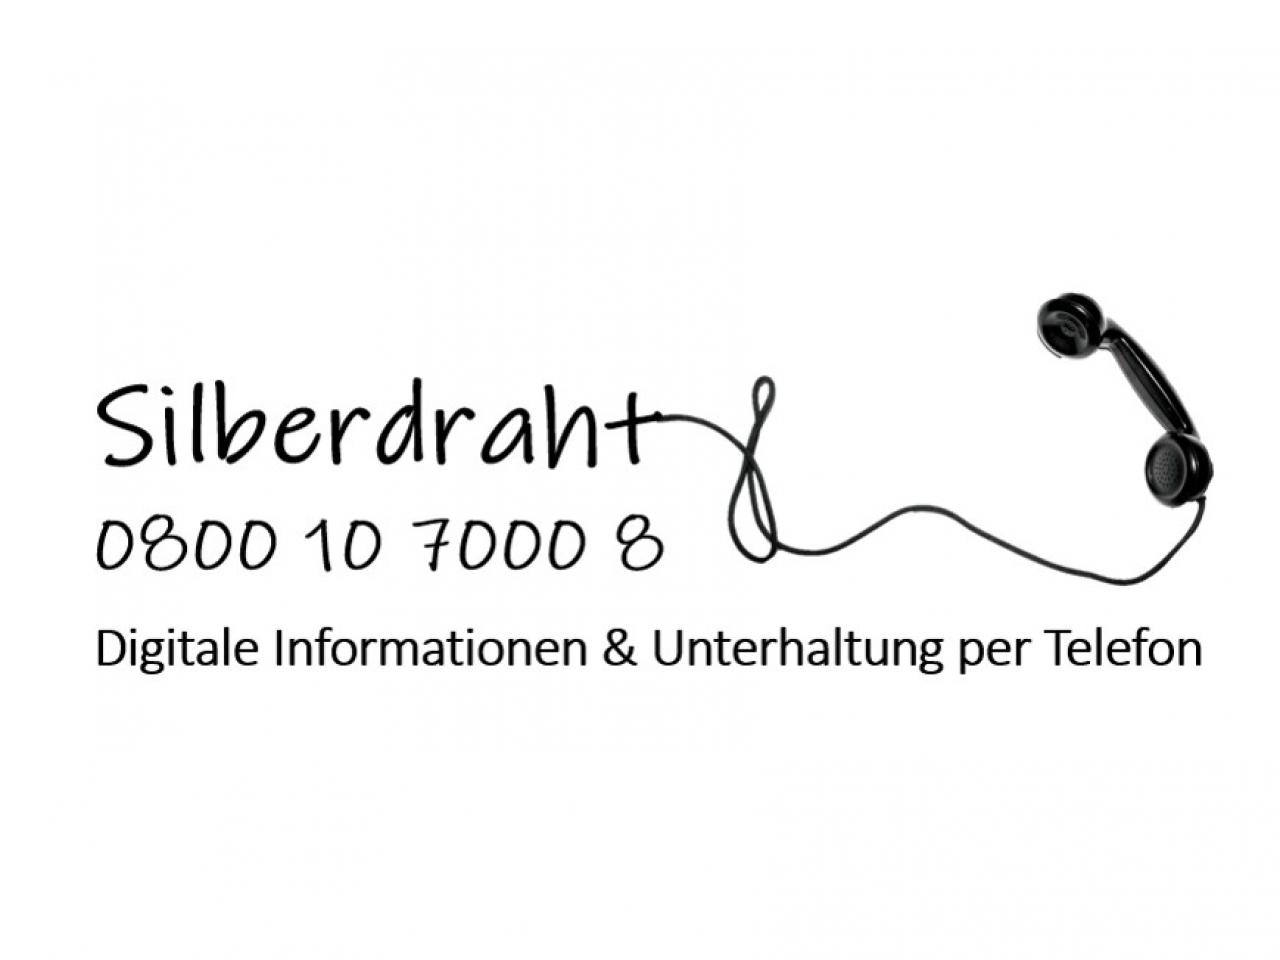 Telefonnummer Silberdraht: 0800 1070008